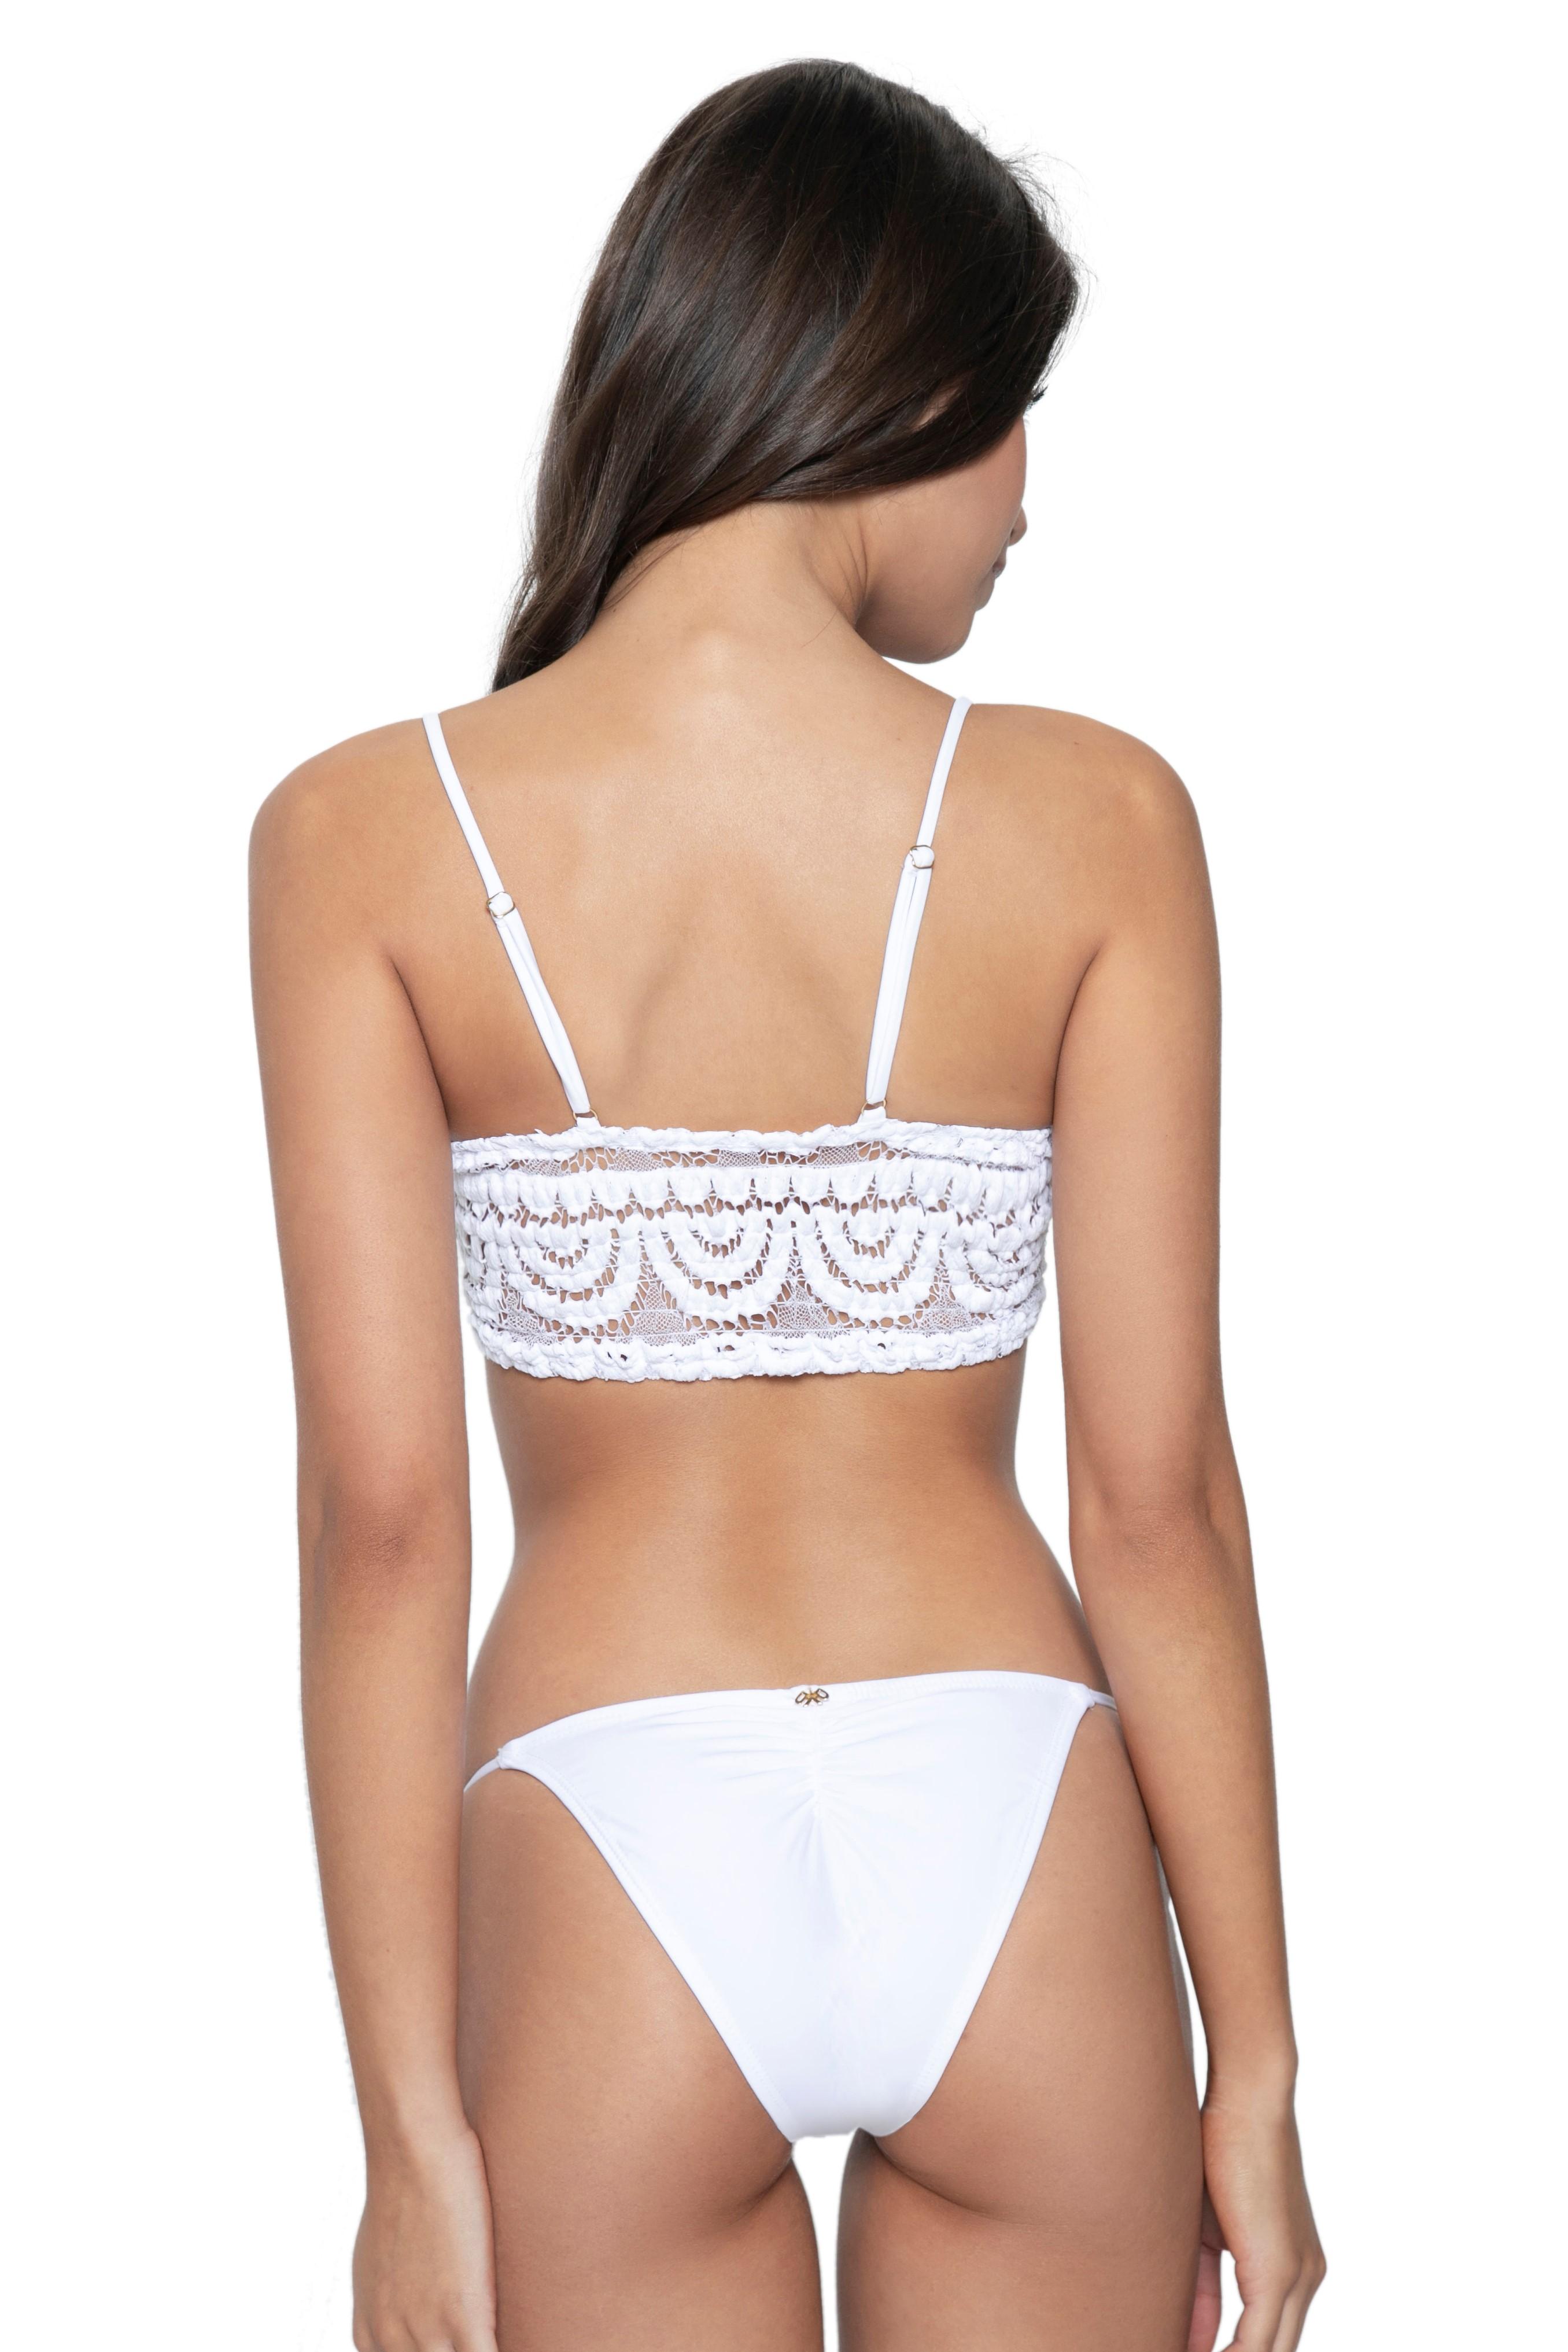 Pilyq Swim Water Lily Lace Sweatheart Bralette Bikini White